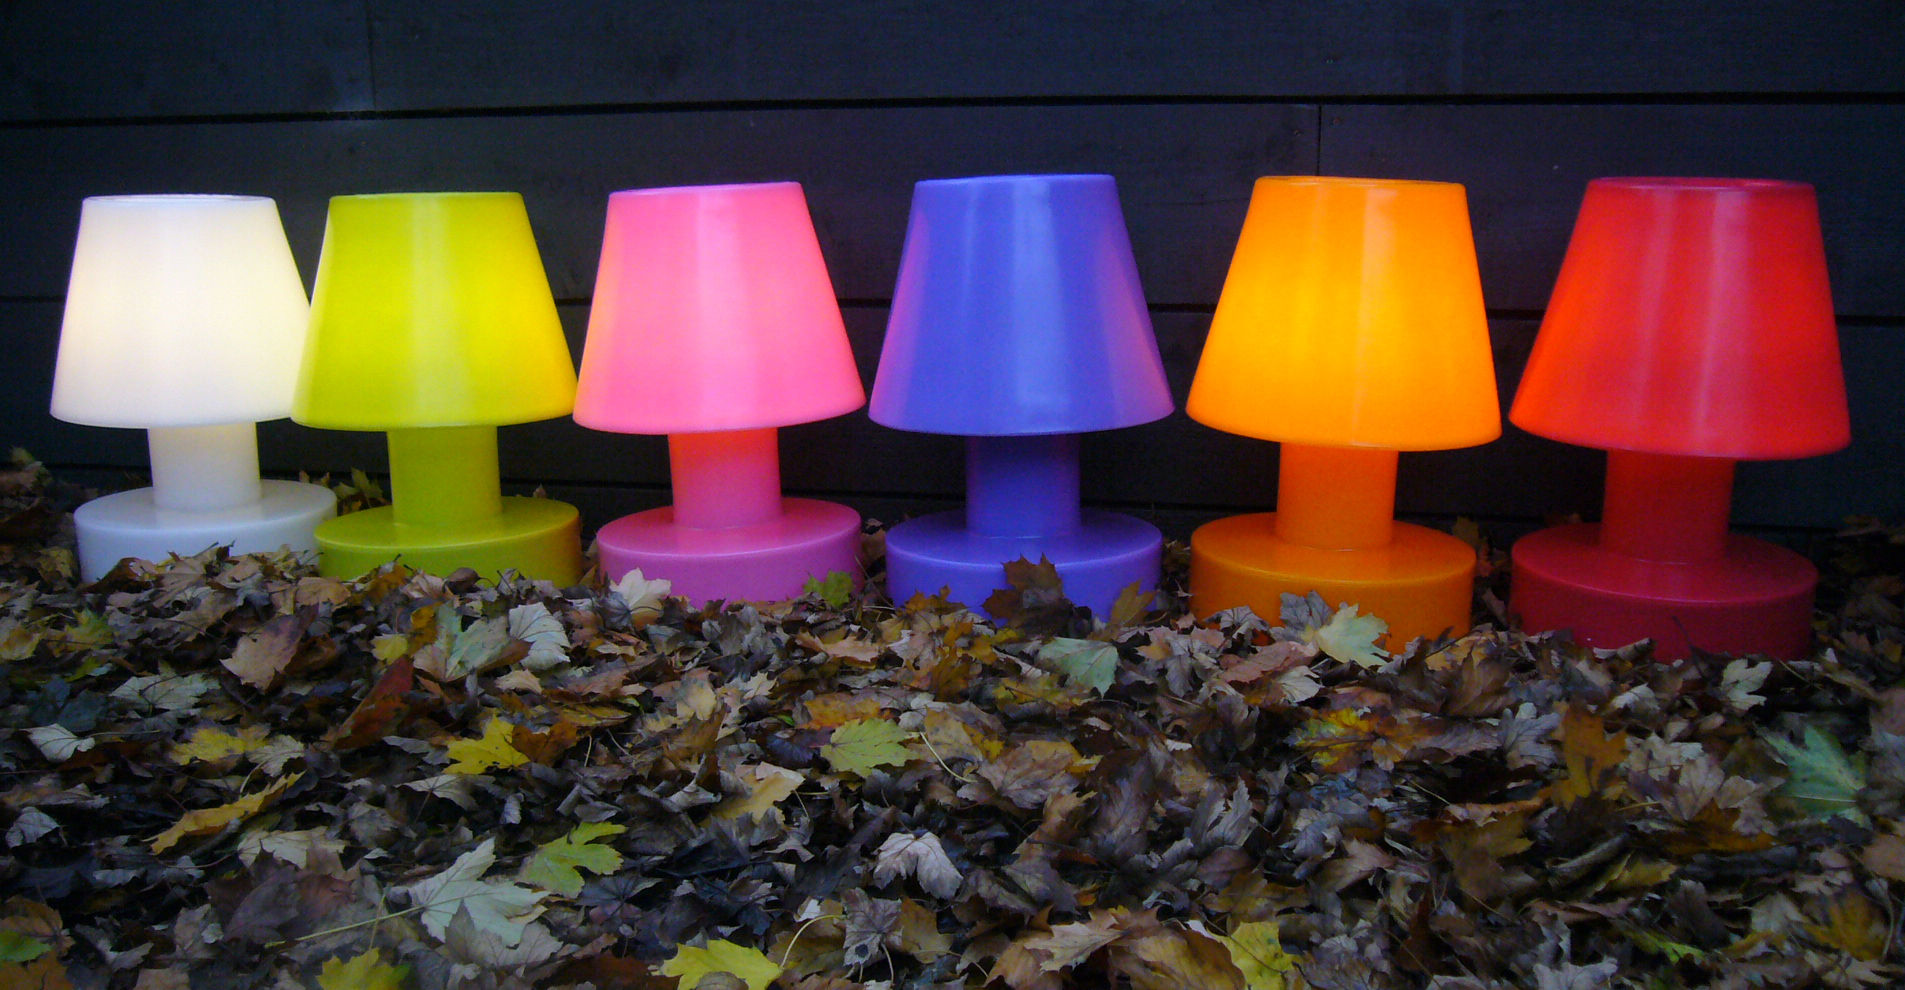 Lampioni Da Giardino Ikea Excellent Lampade Solari Da Giardino Ikea